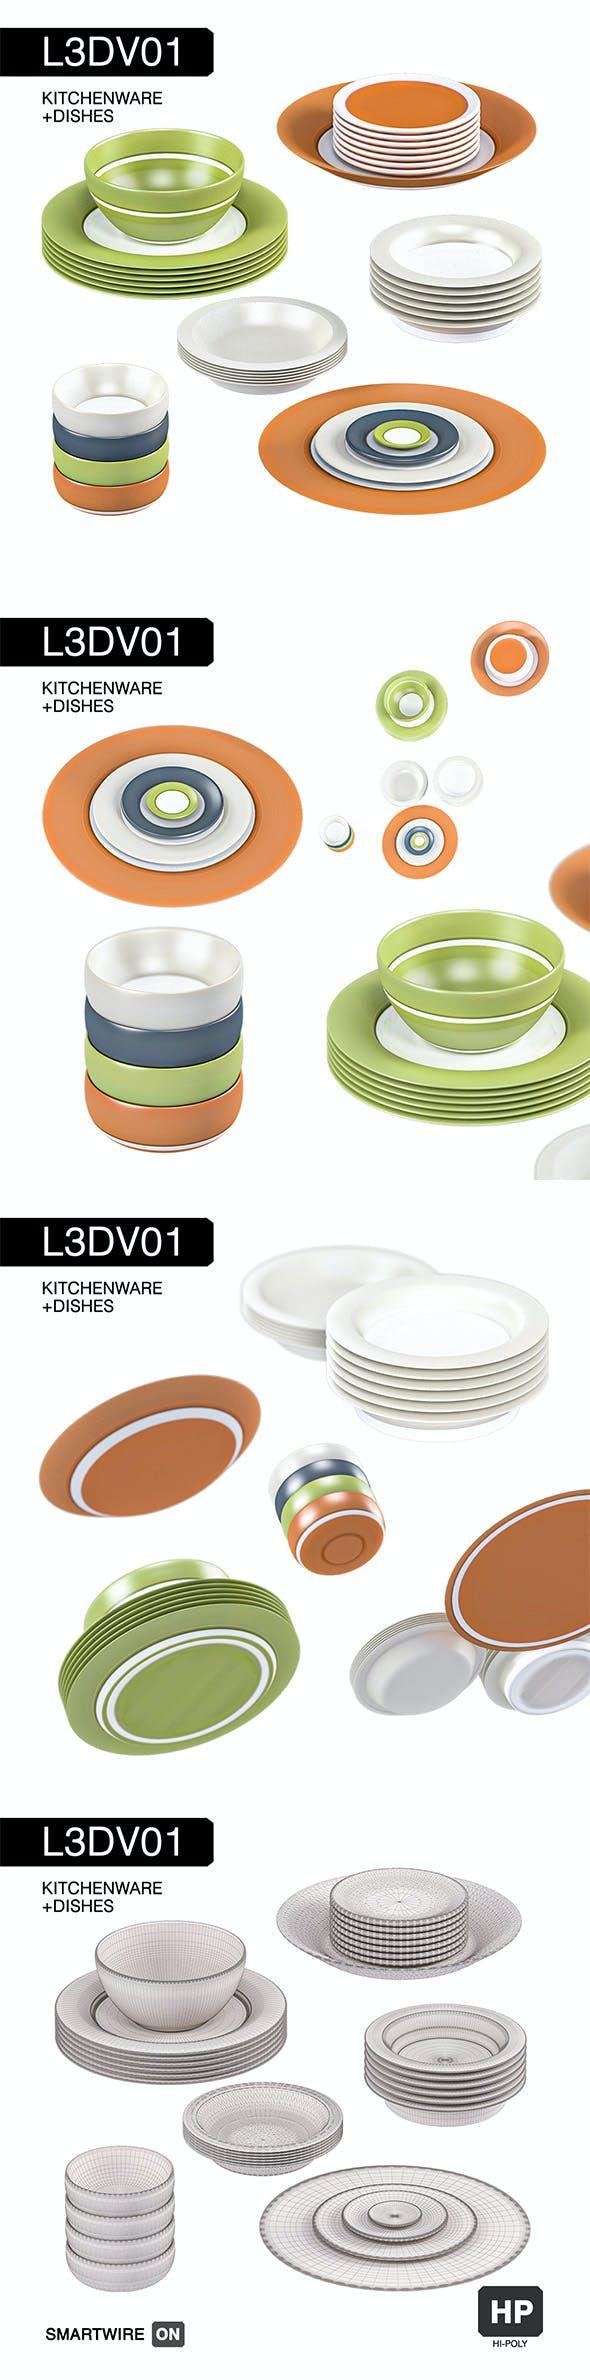 L3DV01G05 - kitchen dishes set - 3DOcean Item for Sale